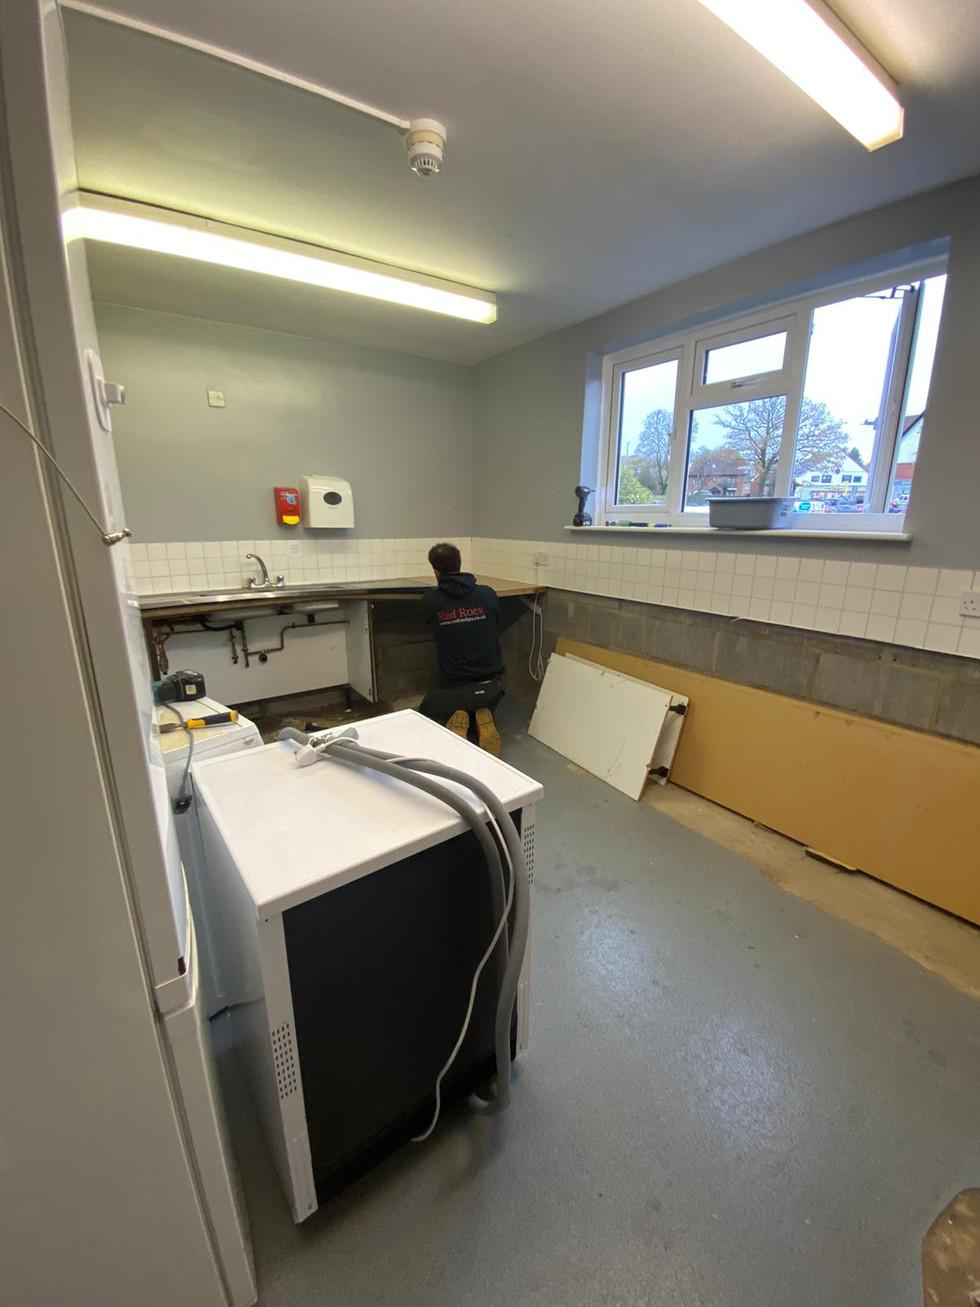 Kitchen Renovation (Dec 2020)